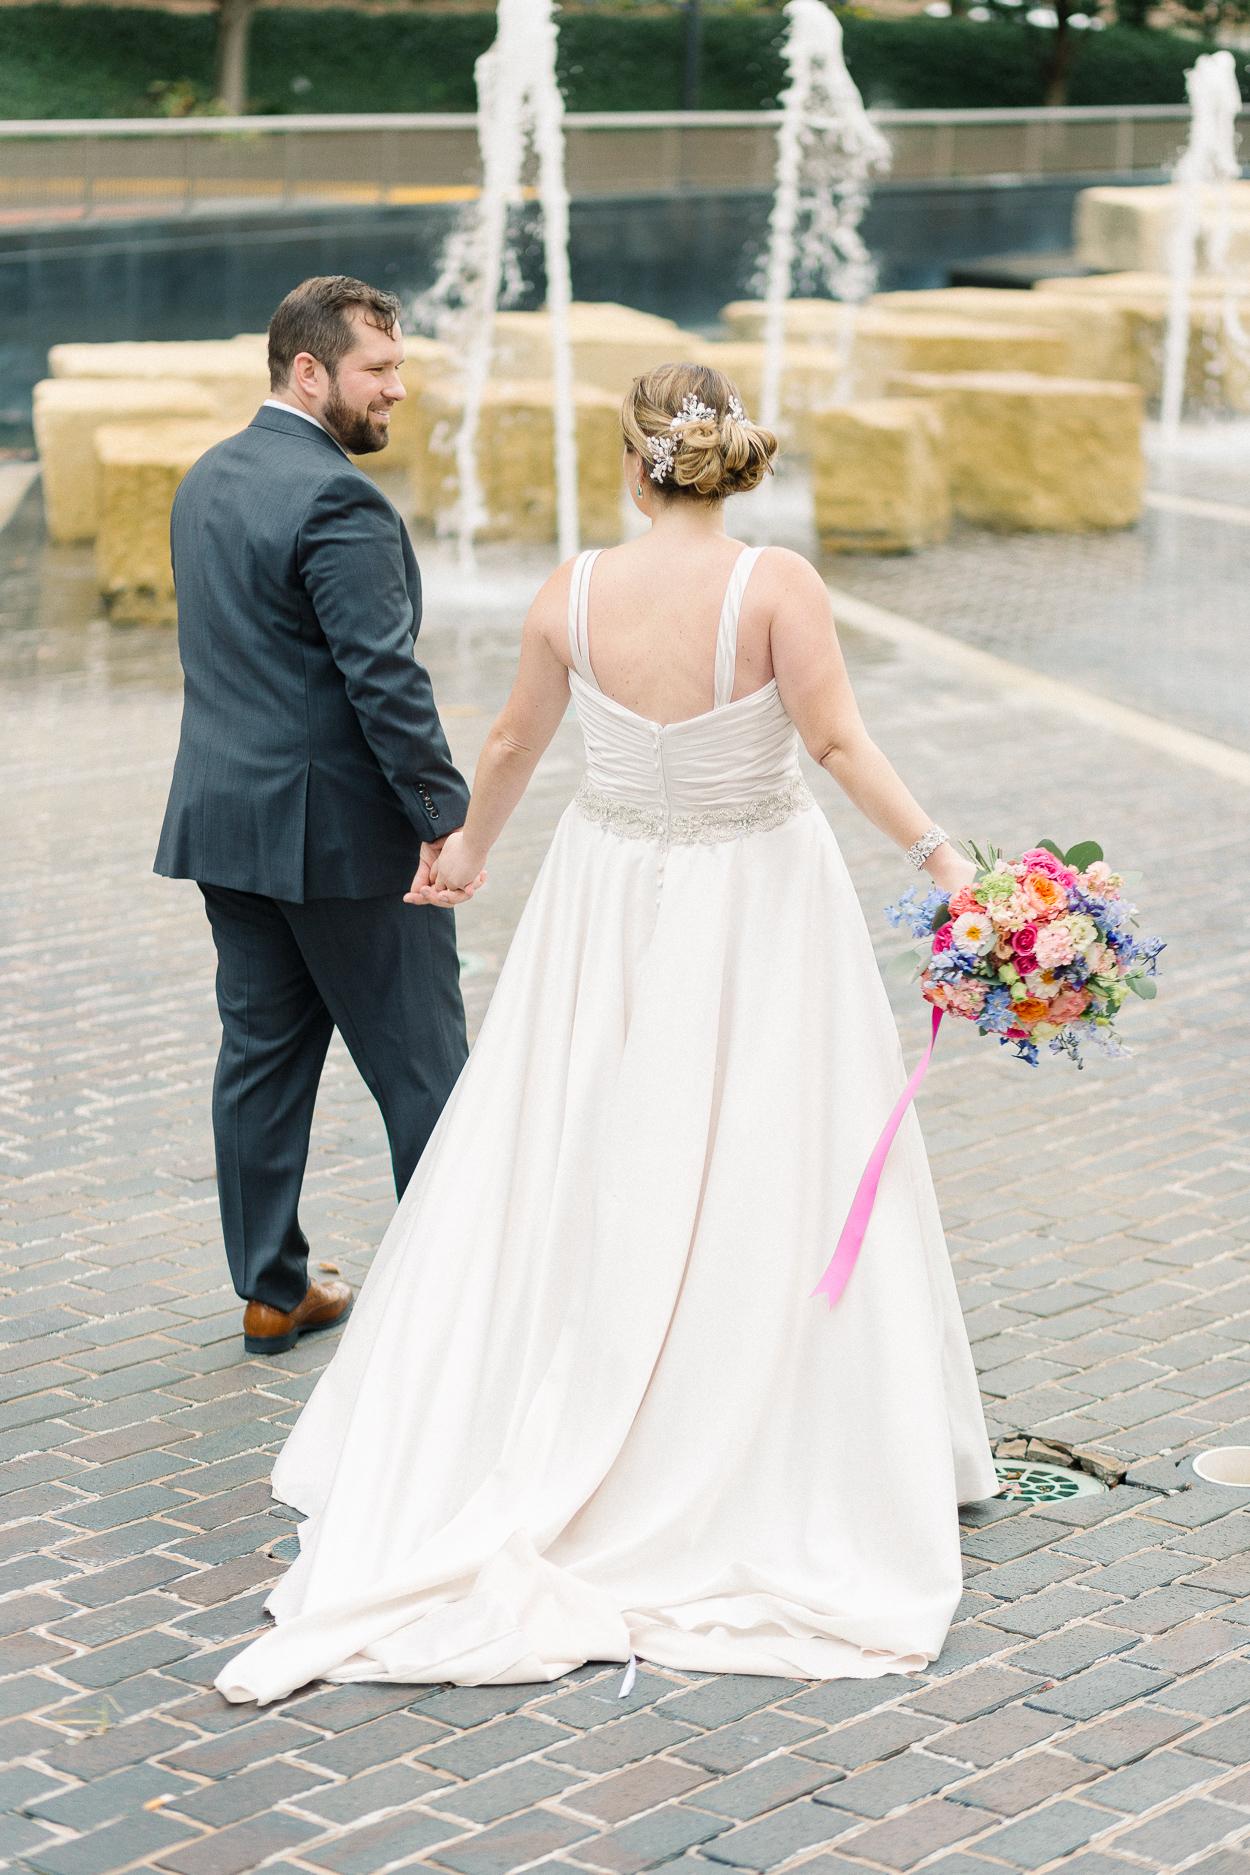 tower-club-wedding-tysons-corner-photographer-michelle-whitley